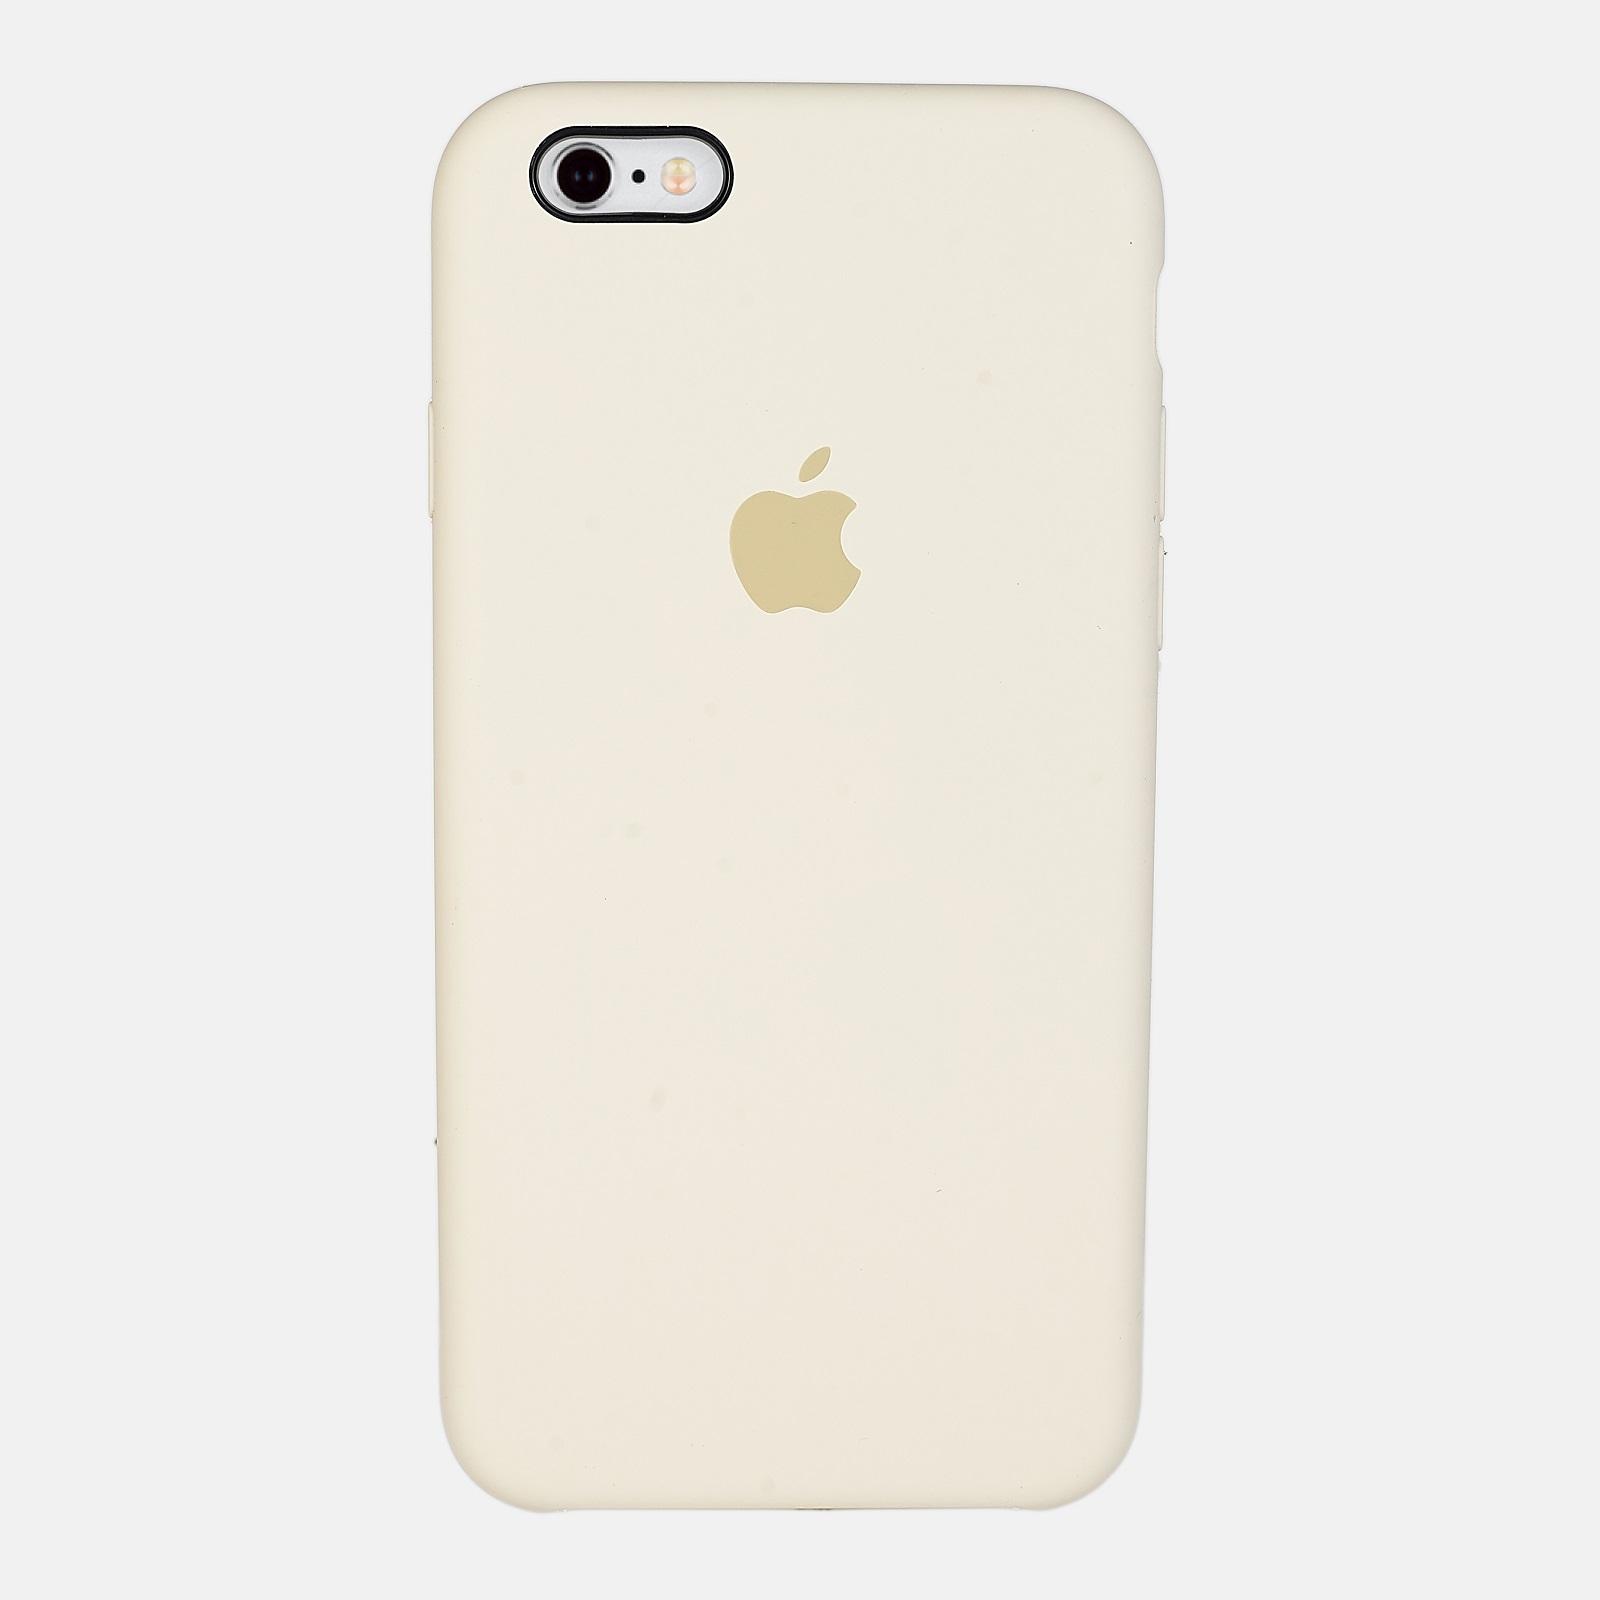 Бежевый чехол Silicone Case для iPhone 6/6S